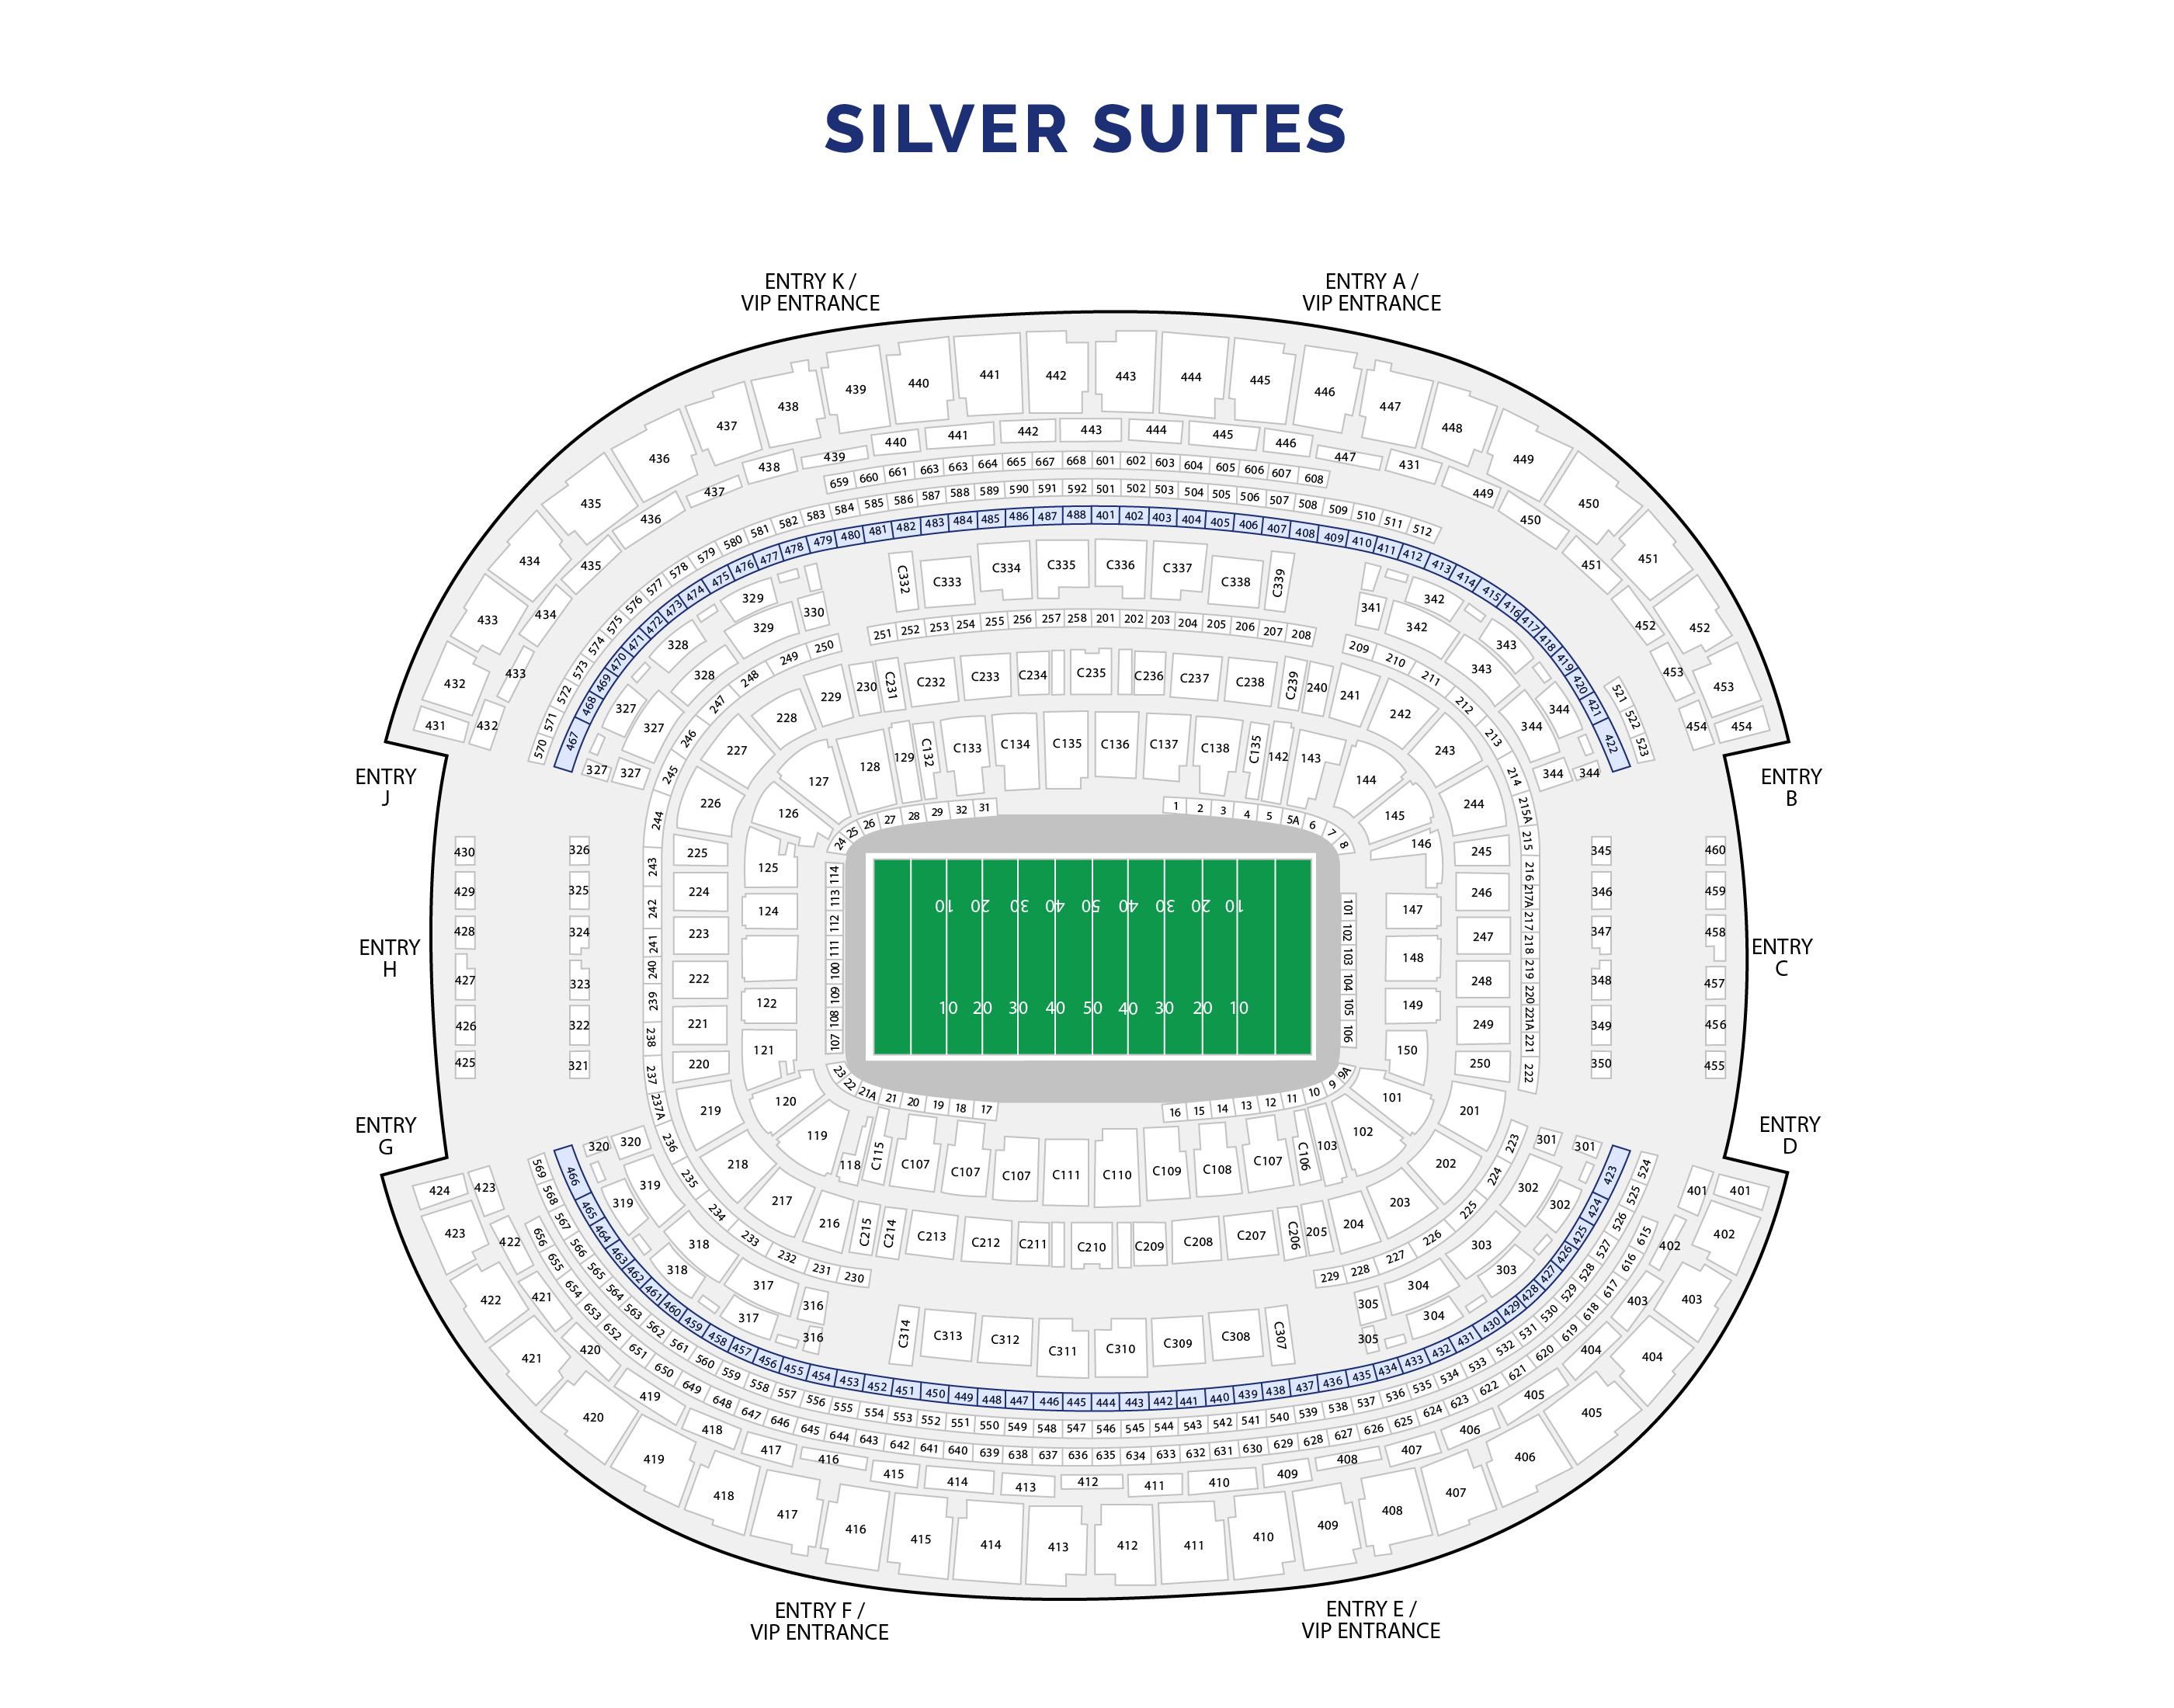 Silver Suites